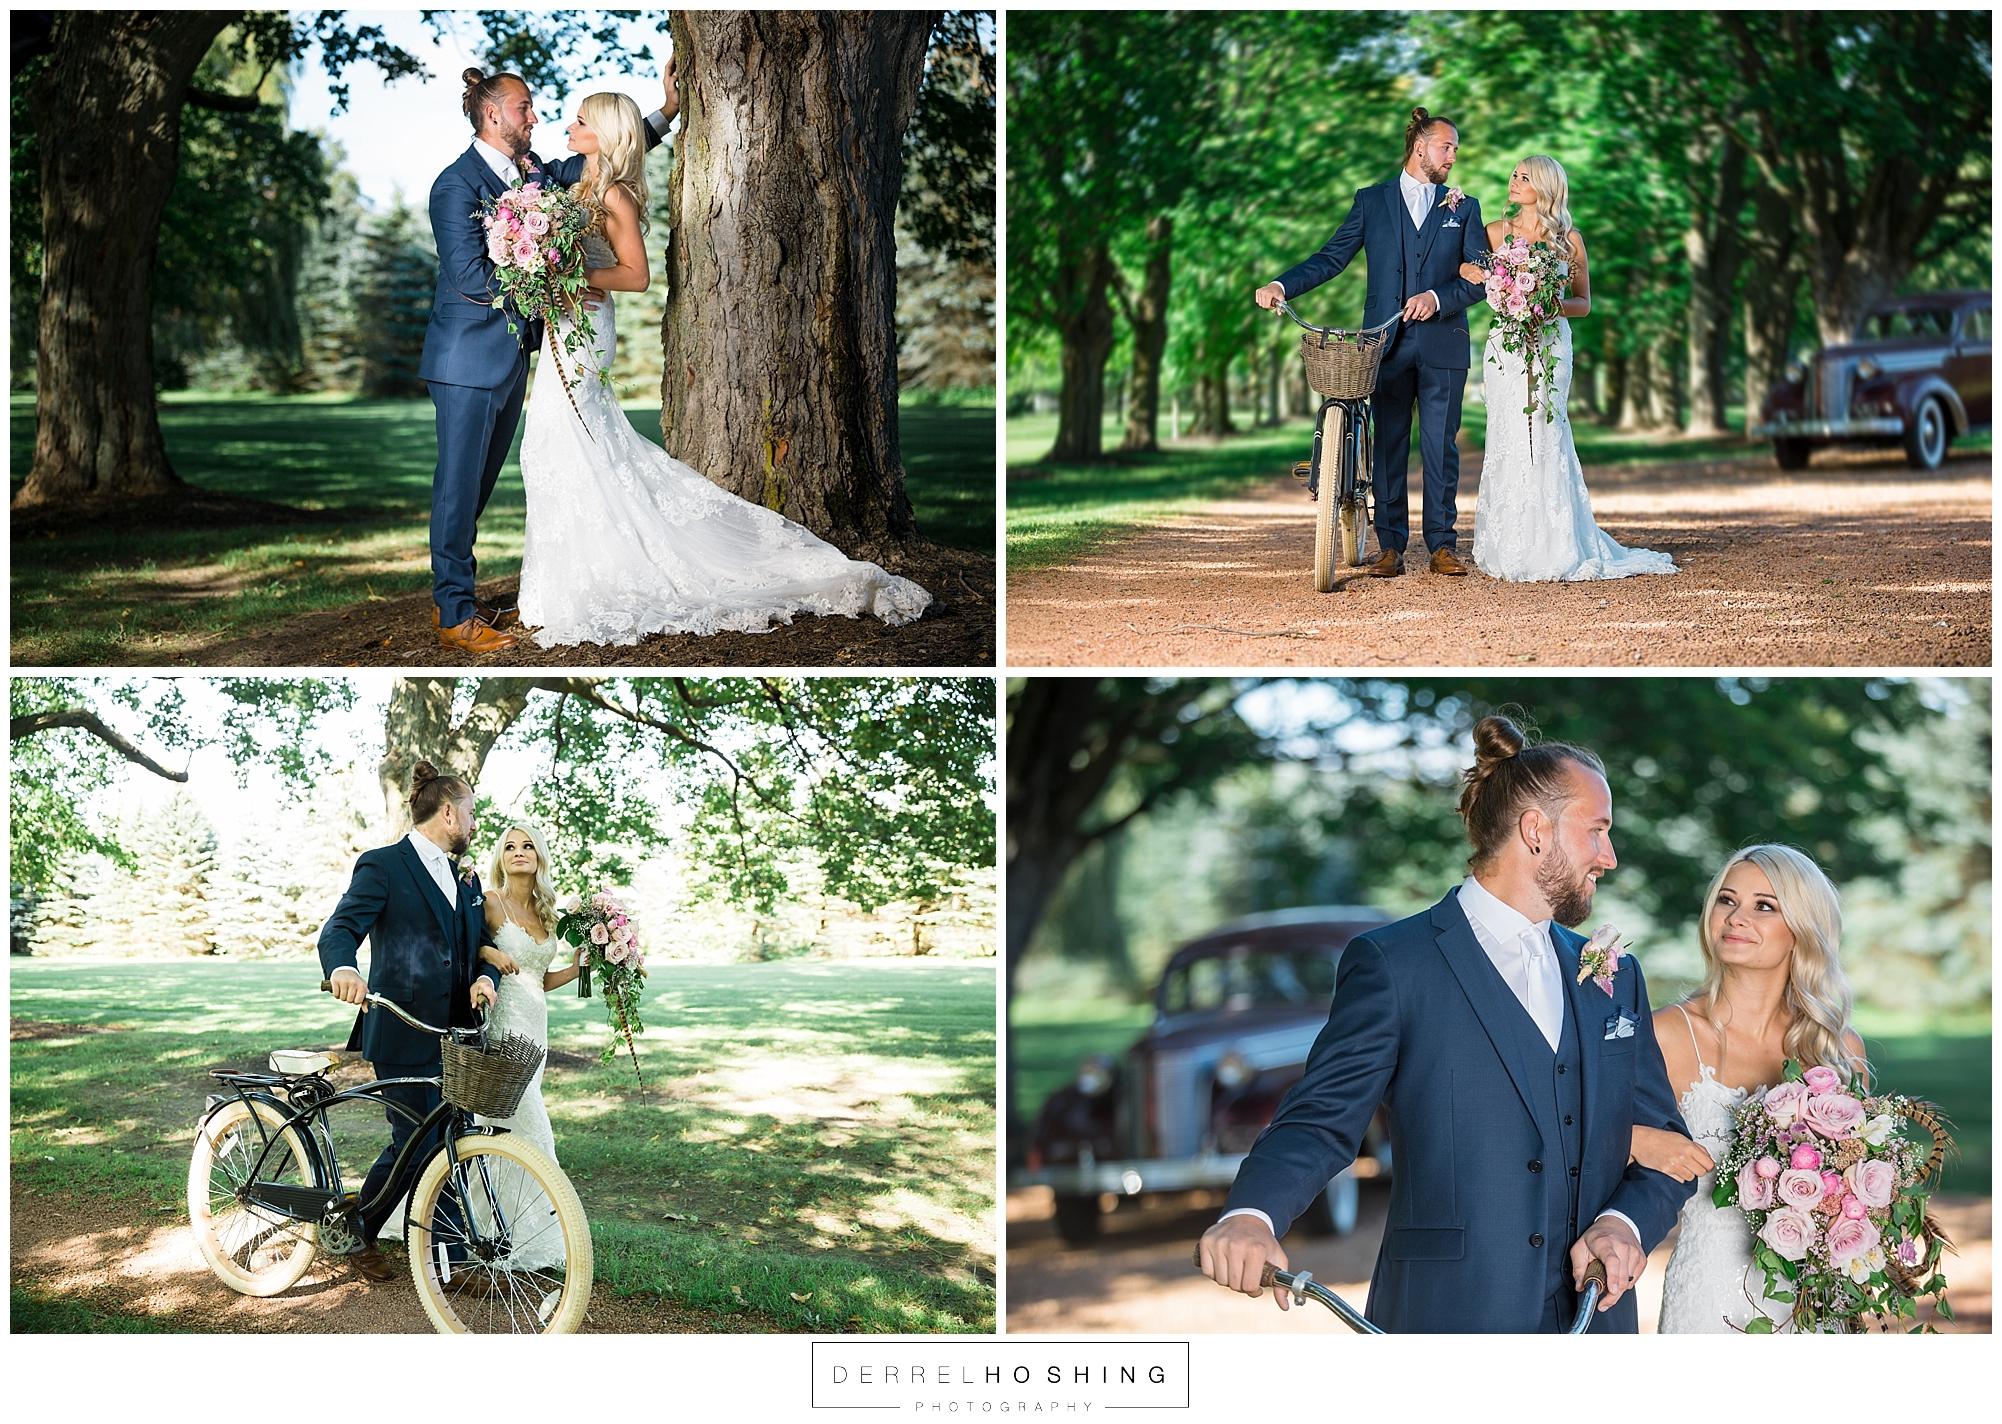 Belcroft-Estates-&-Event-Centre-Wedding-Innisfil-Ontario-0015.jpg